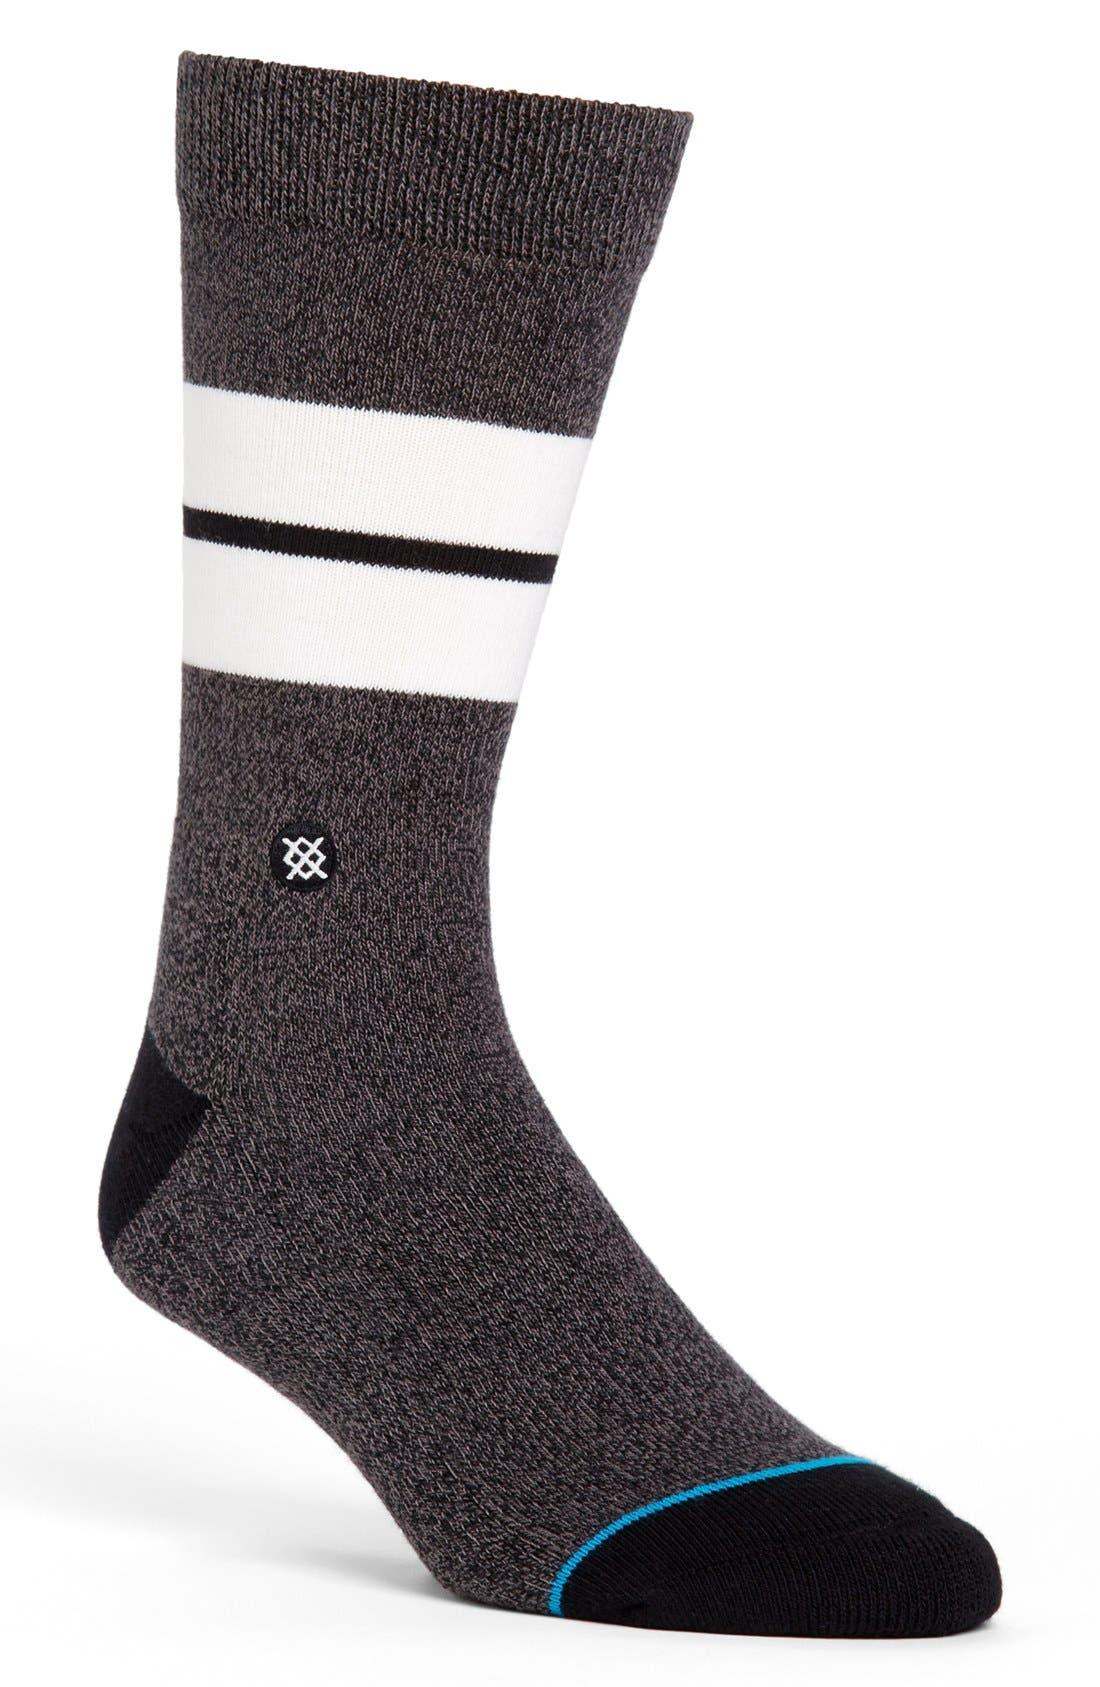 Main Image - Stance 'Sequoia' Socks